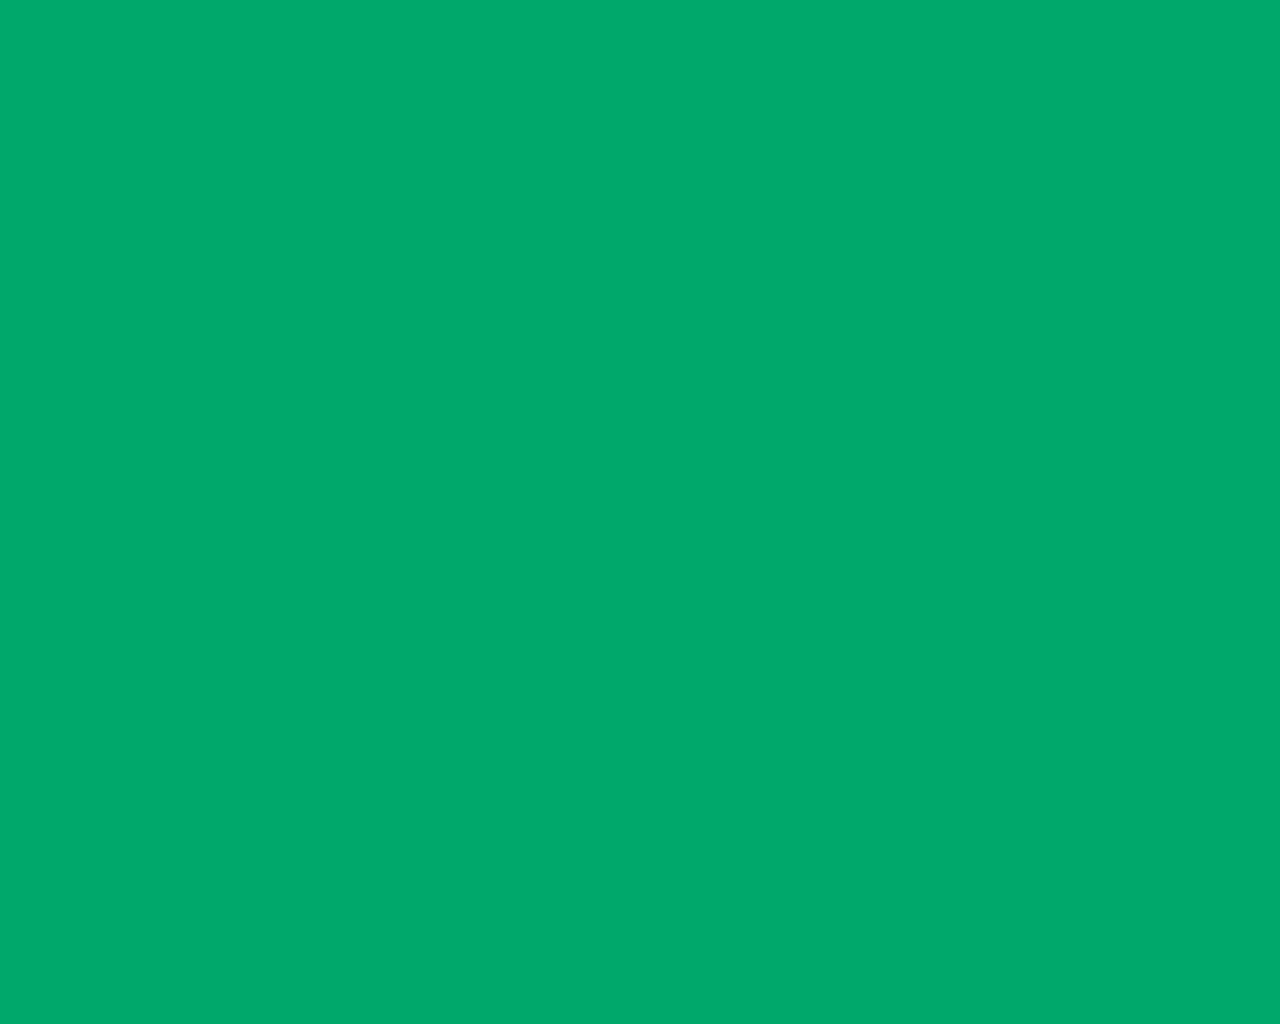 Fular elasticado color verde cata - Colores verdes azulados ...